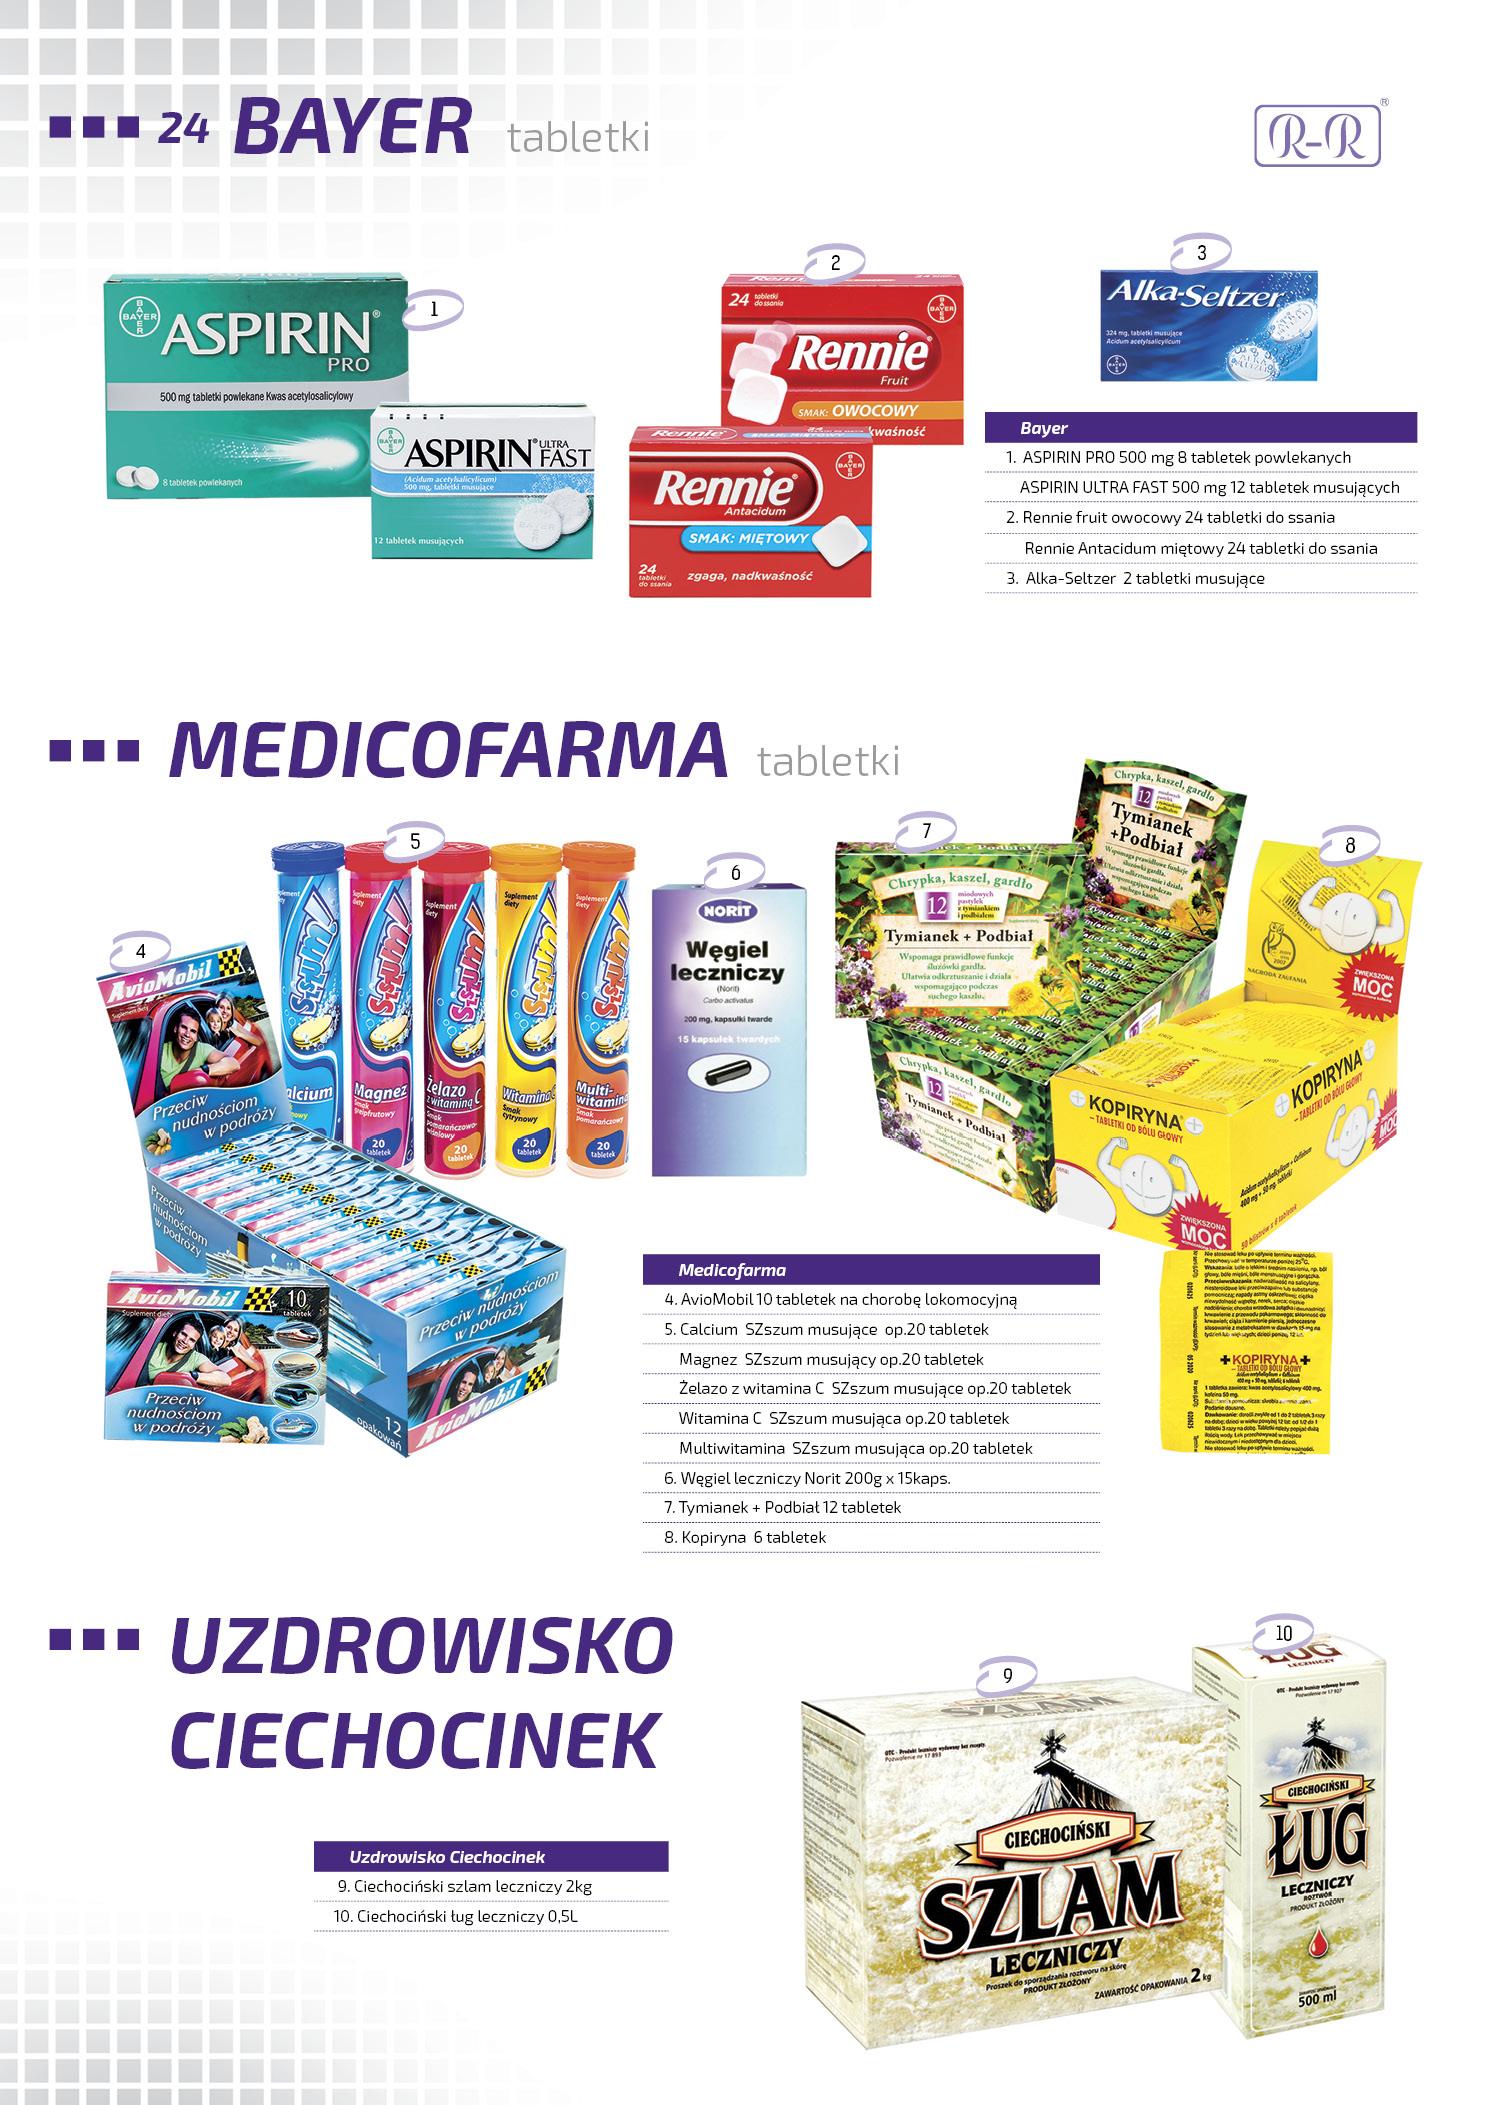 Tabletki Bayer / Tabletki Medicofarma / Uzdrowisko Ciechocinek